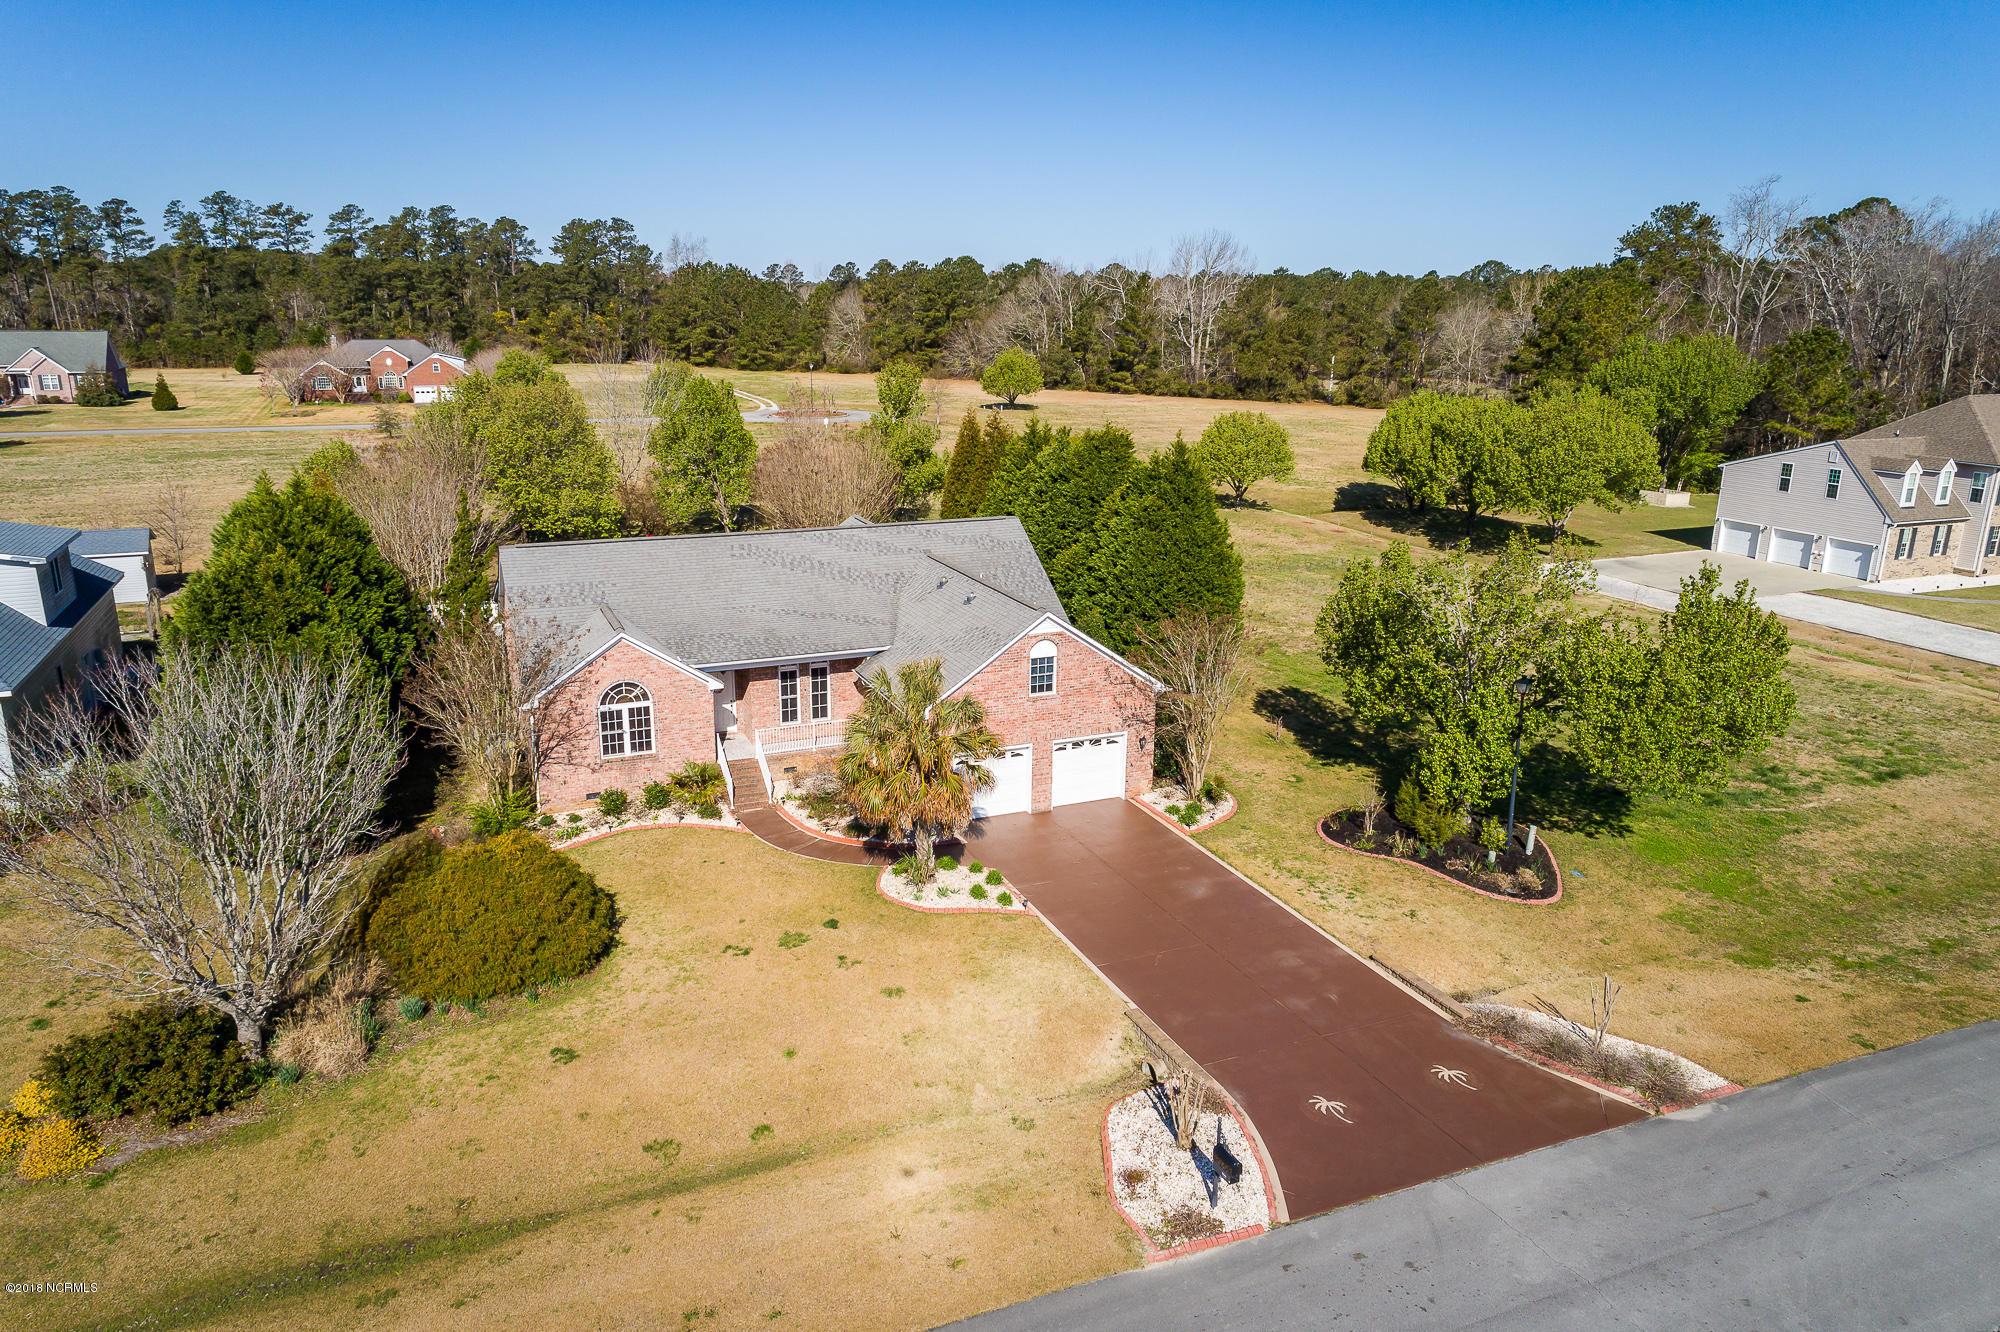 110 Bimini Court, Havelock, North Carolina, 4 Bedrooms Bedrooms, 7 Rooms Rooms,3 BathroomsBathrooms,Single family residence,For sale,Bimini,100110700